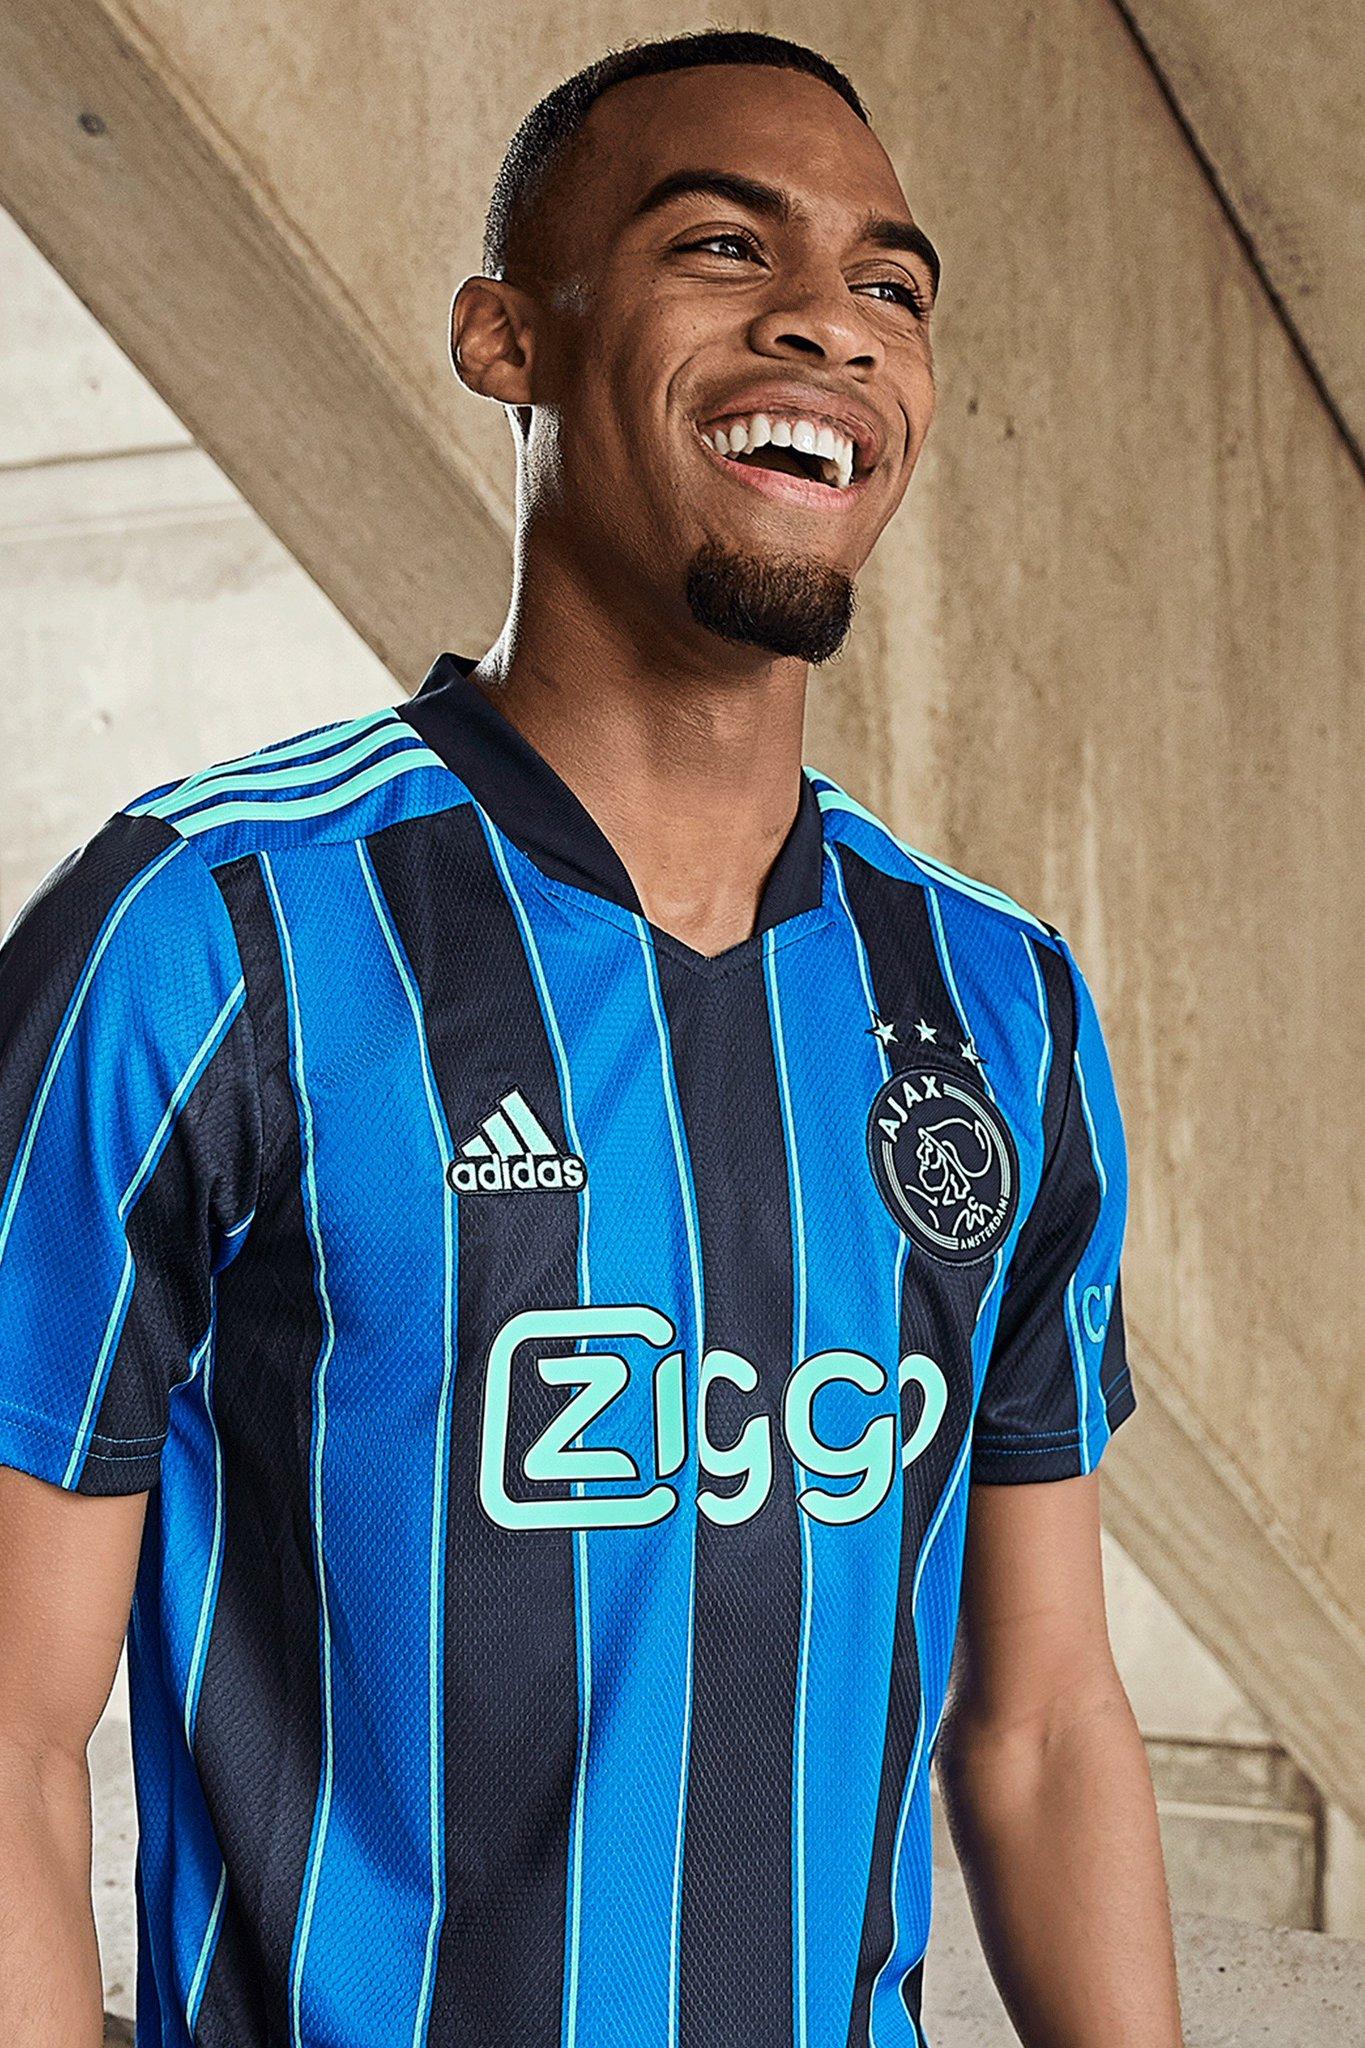 Maillot extérieur 2021-2022 Ajax